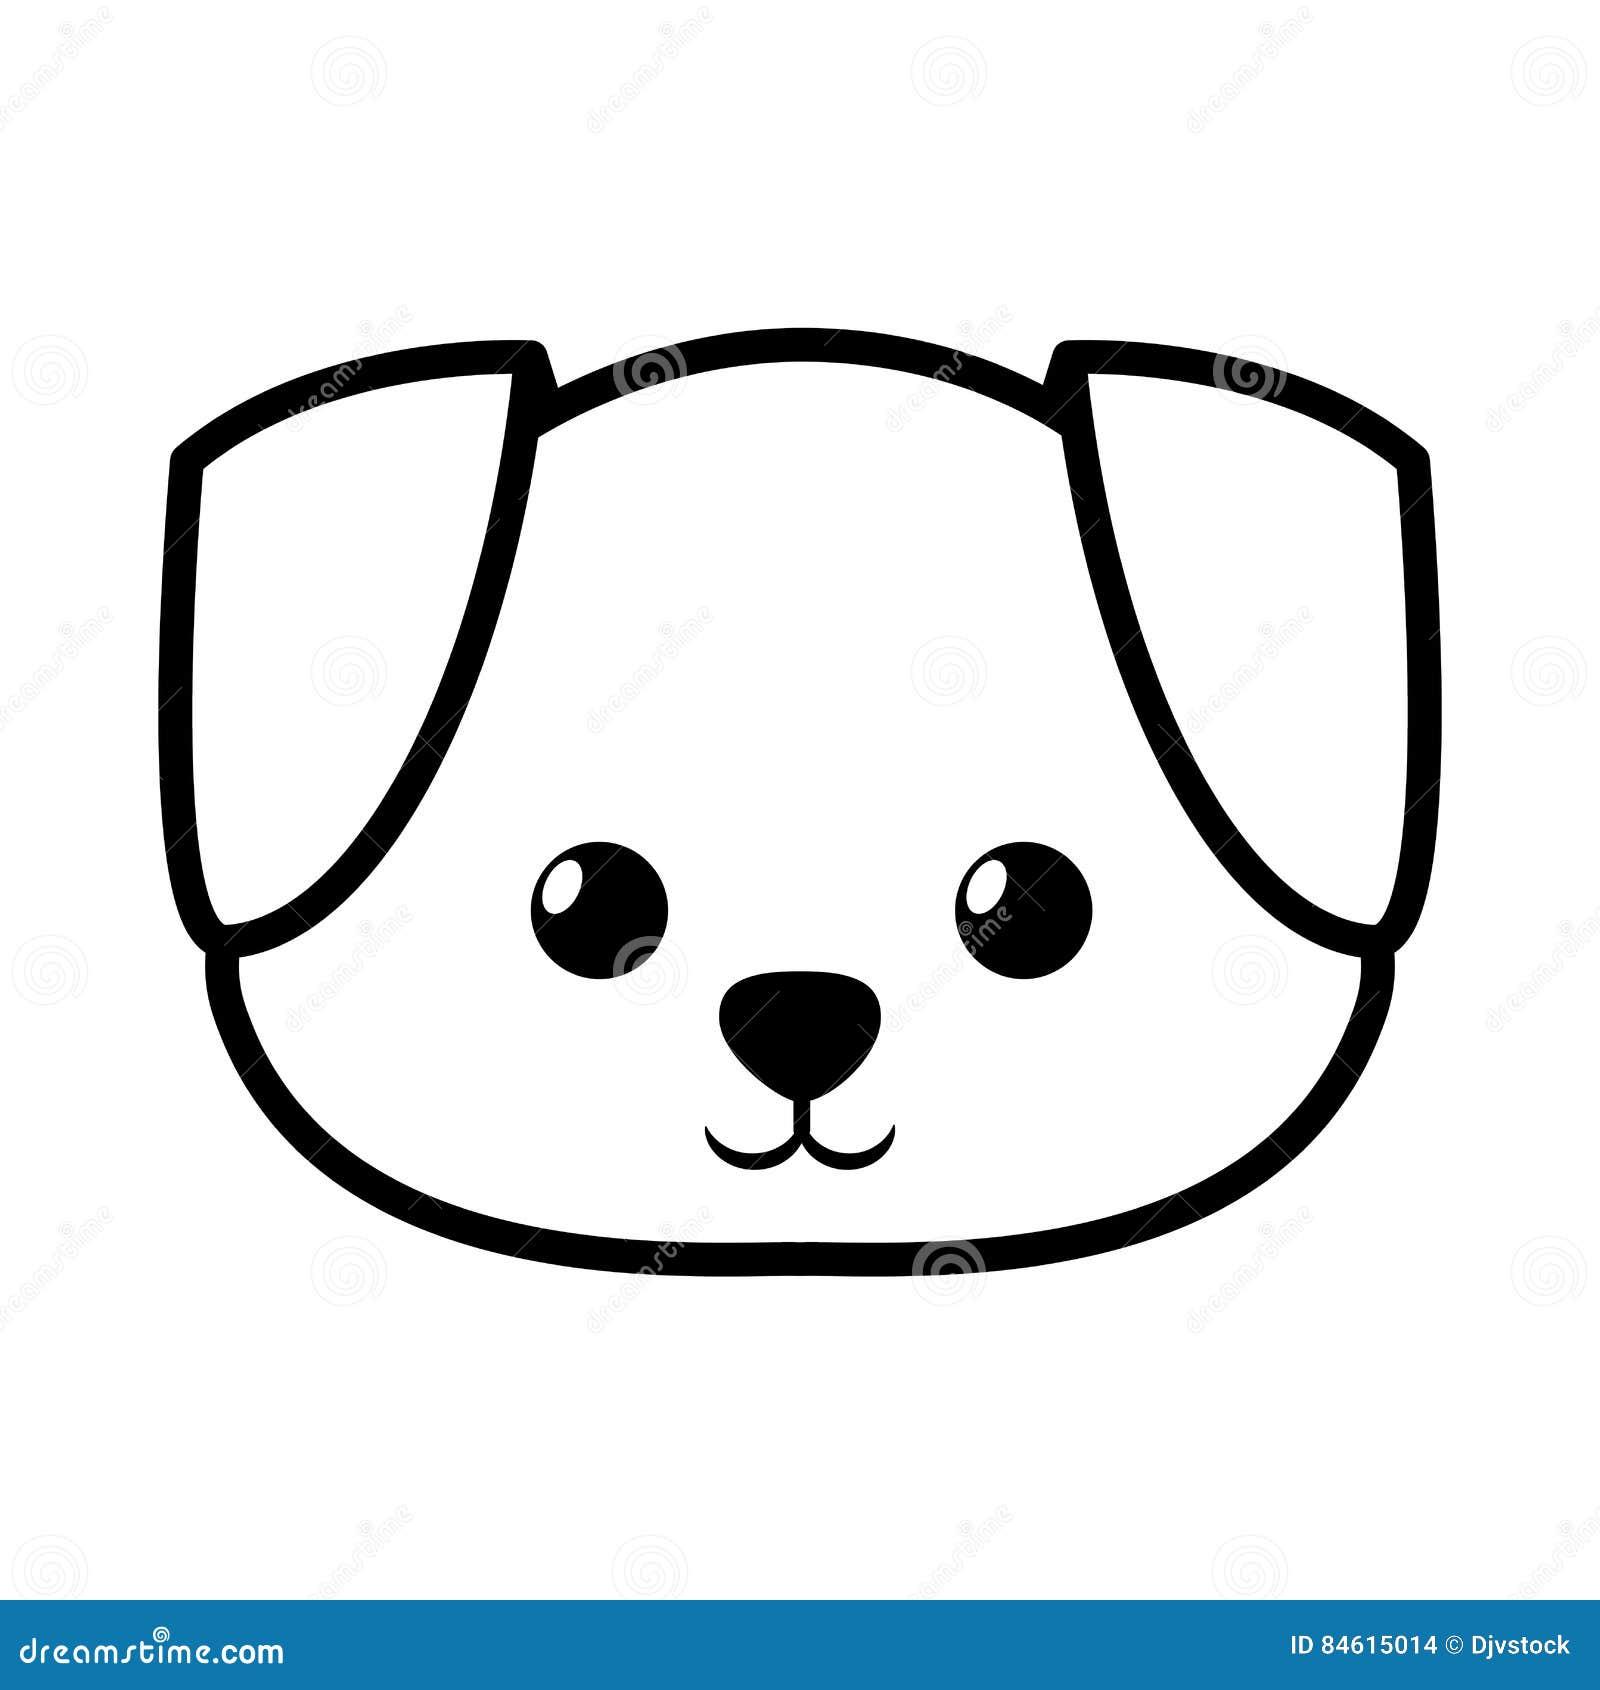 Line Drawing Of A Dog S Face : Face dog adorable pedigree outline stock illustration